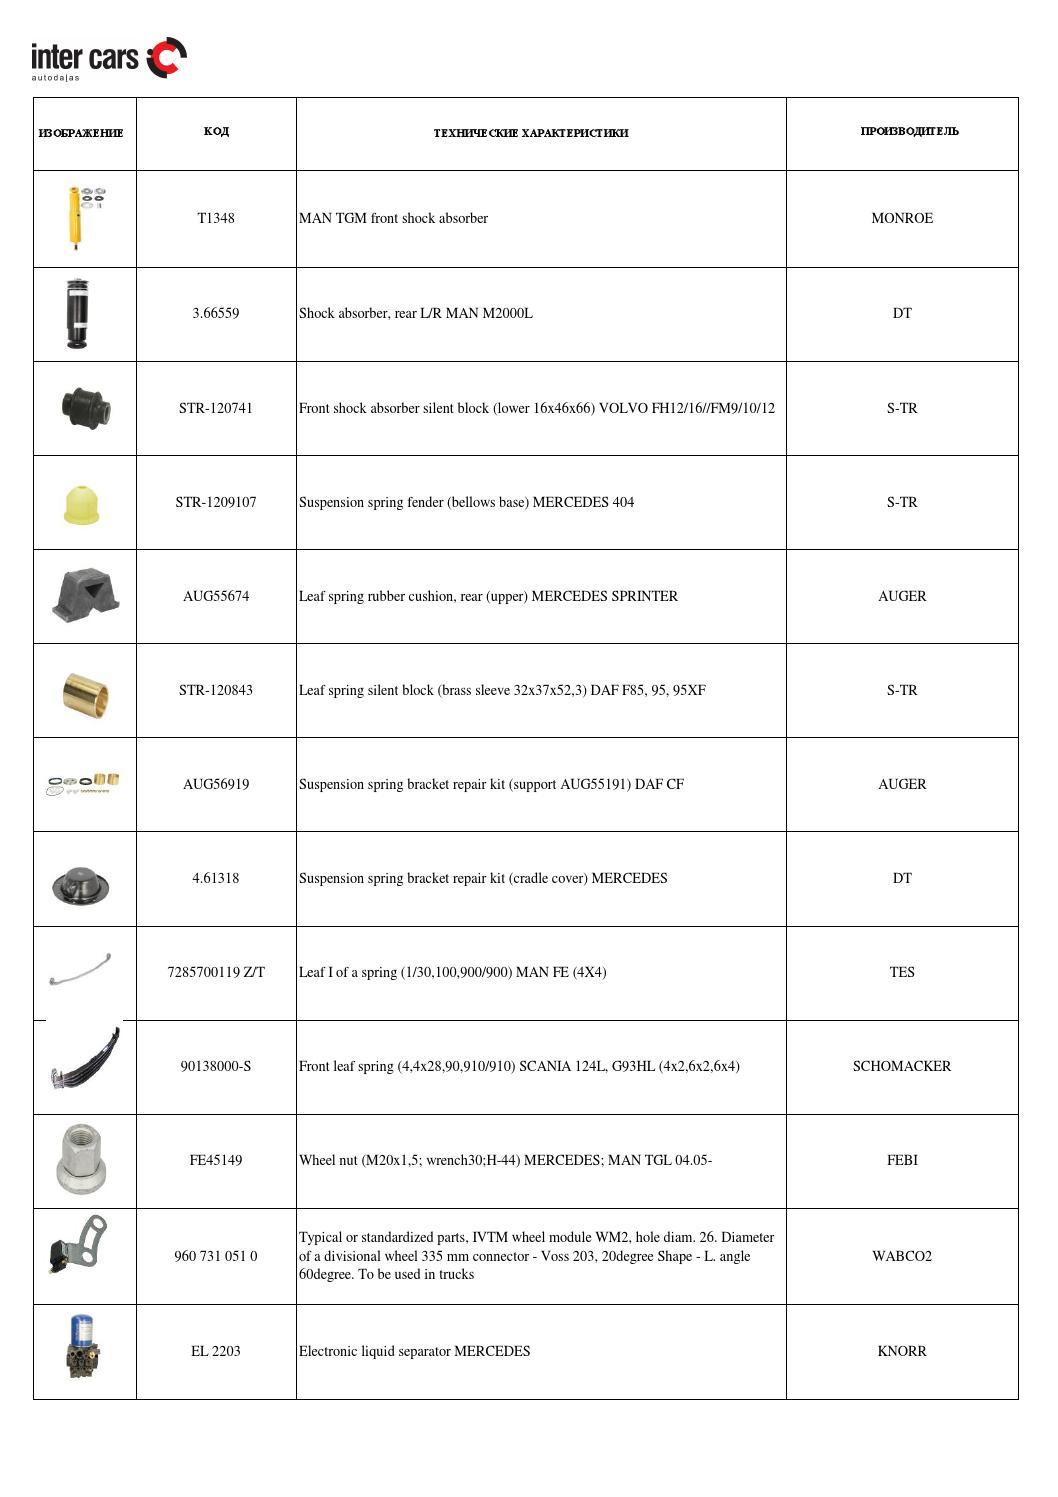 Fiat Ducato Dashboard Symbols Full Hd Pictures [4k Ultra] Full Box Symbols  Mean Daf Fuse Box Symbols